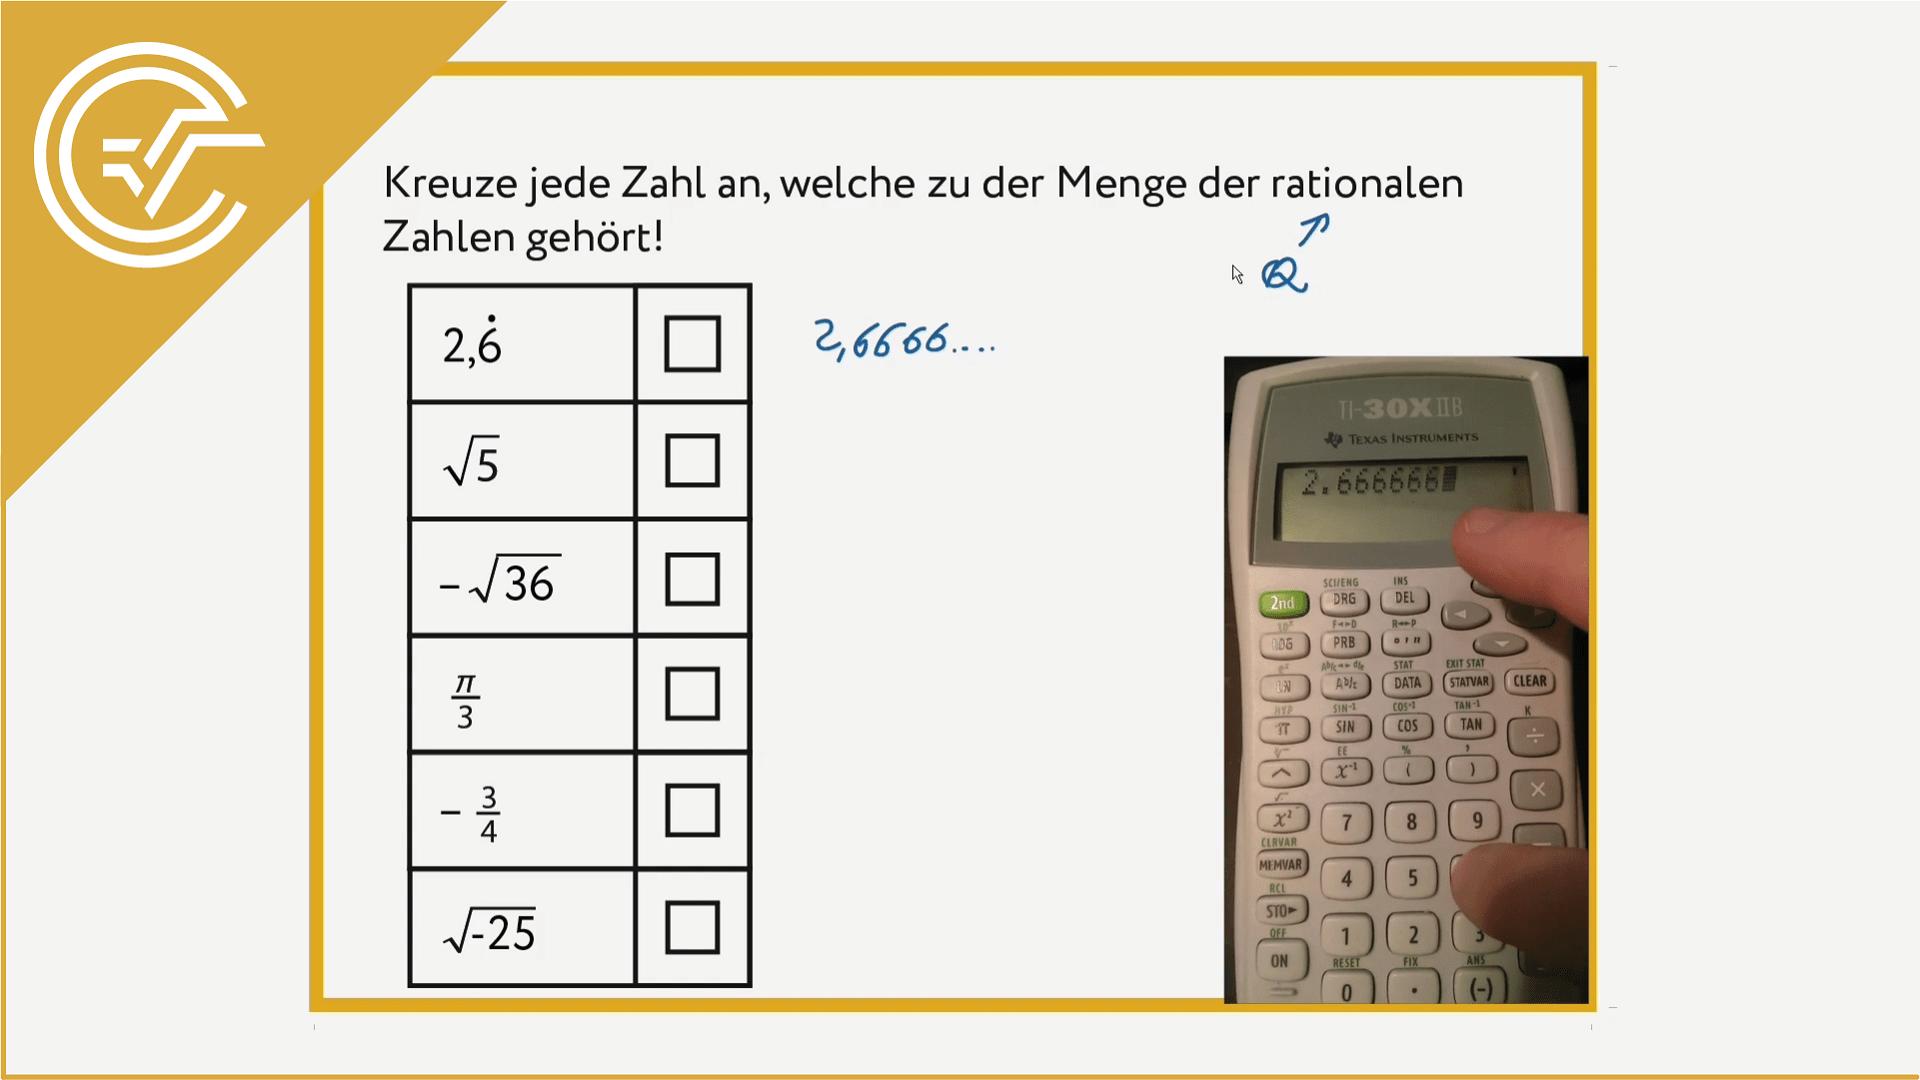 AG 1.1 - Zahlenmengen verstehen 2